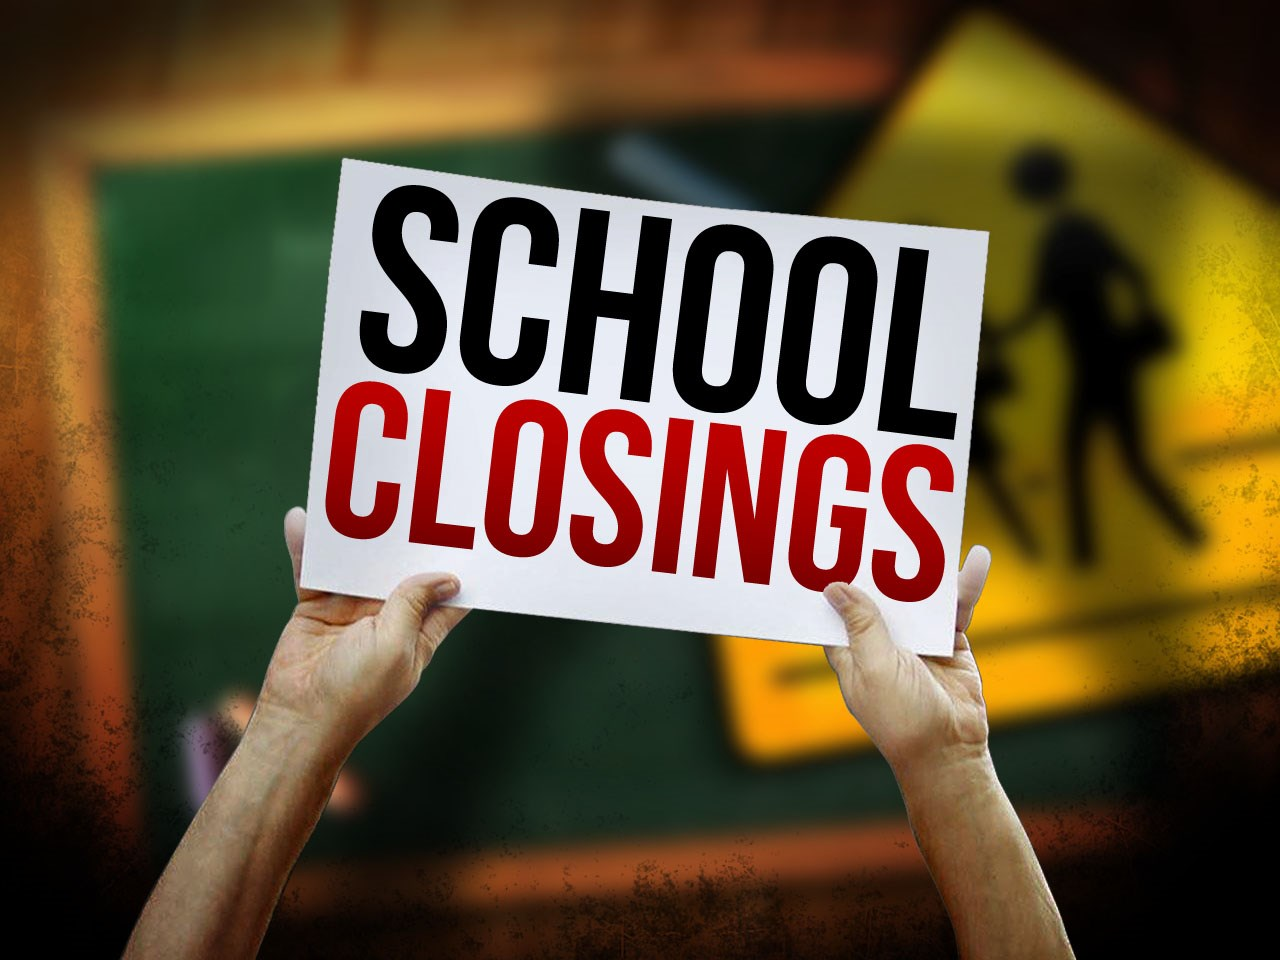 Floyd and Pulaski County Schools dismiss early